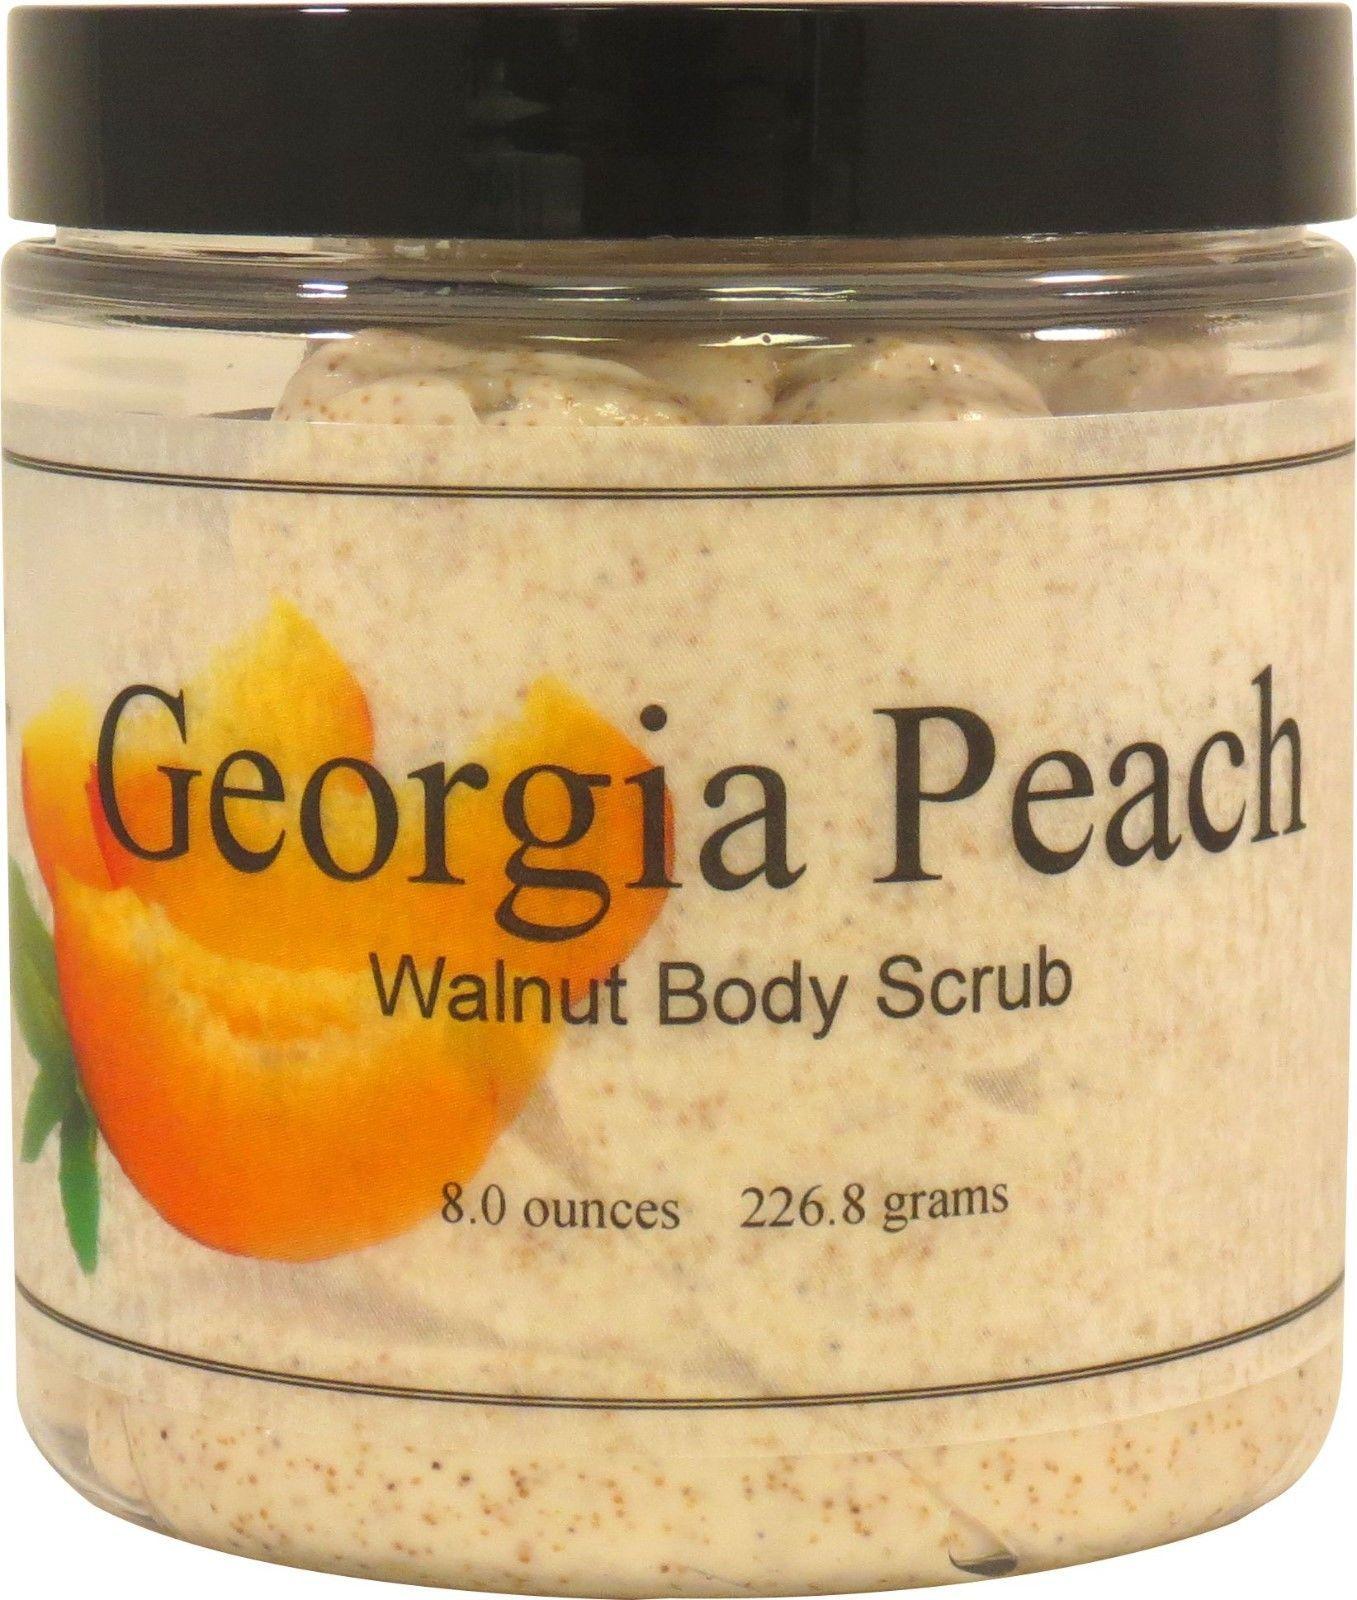 Georgia Peach Walnut Body Scrub